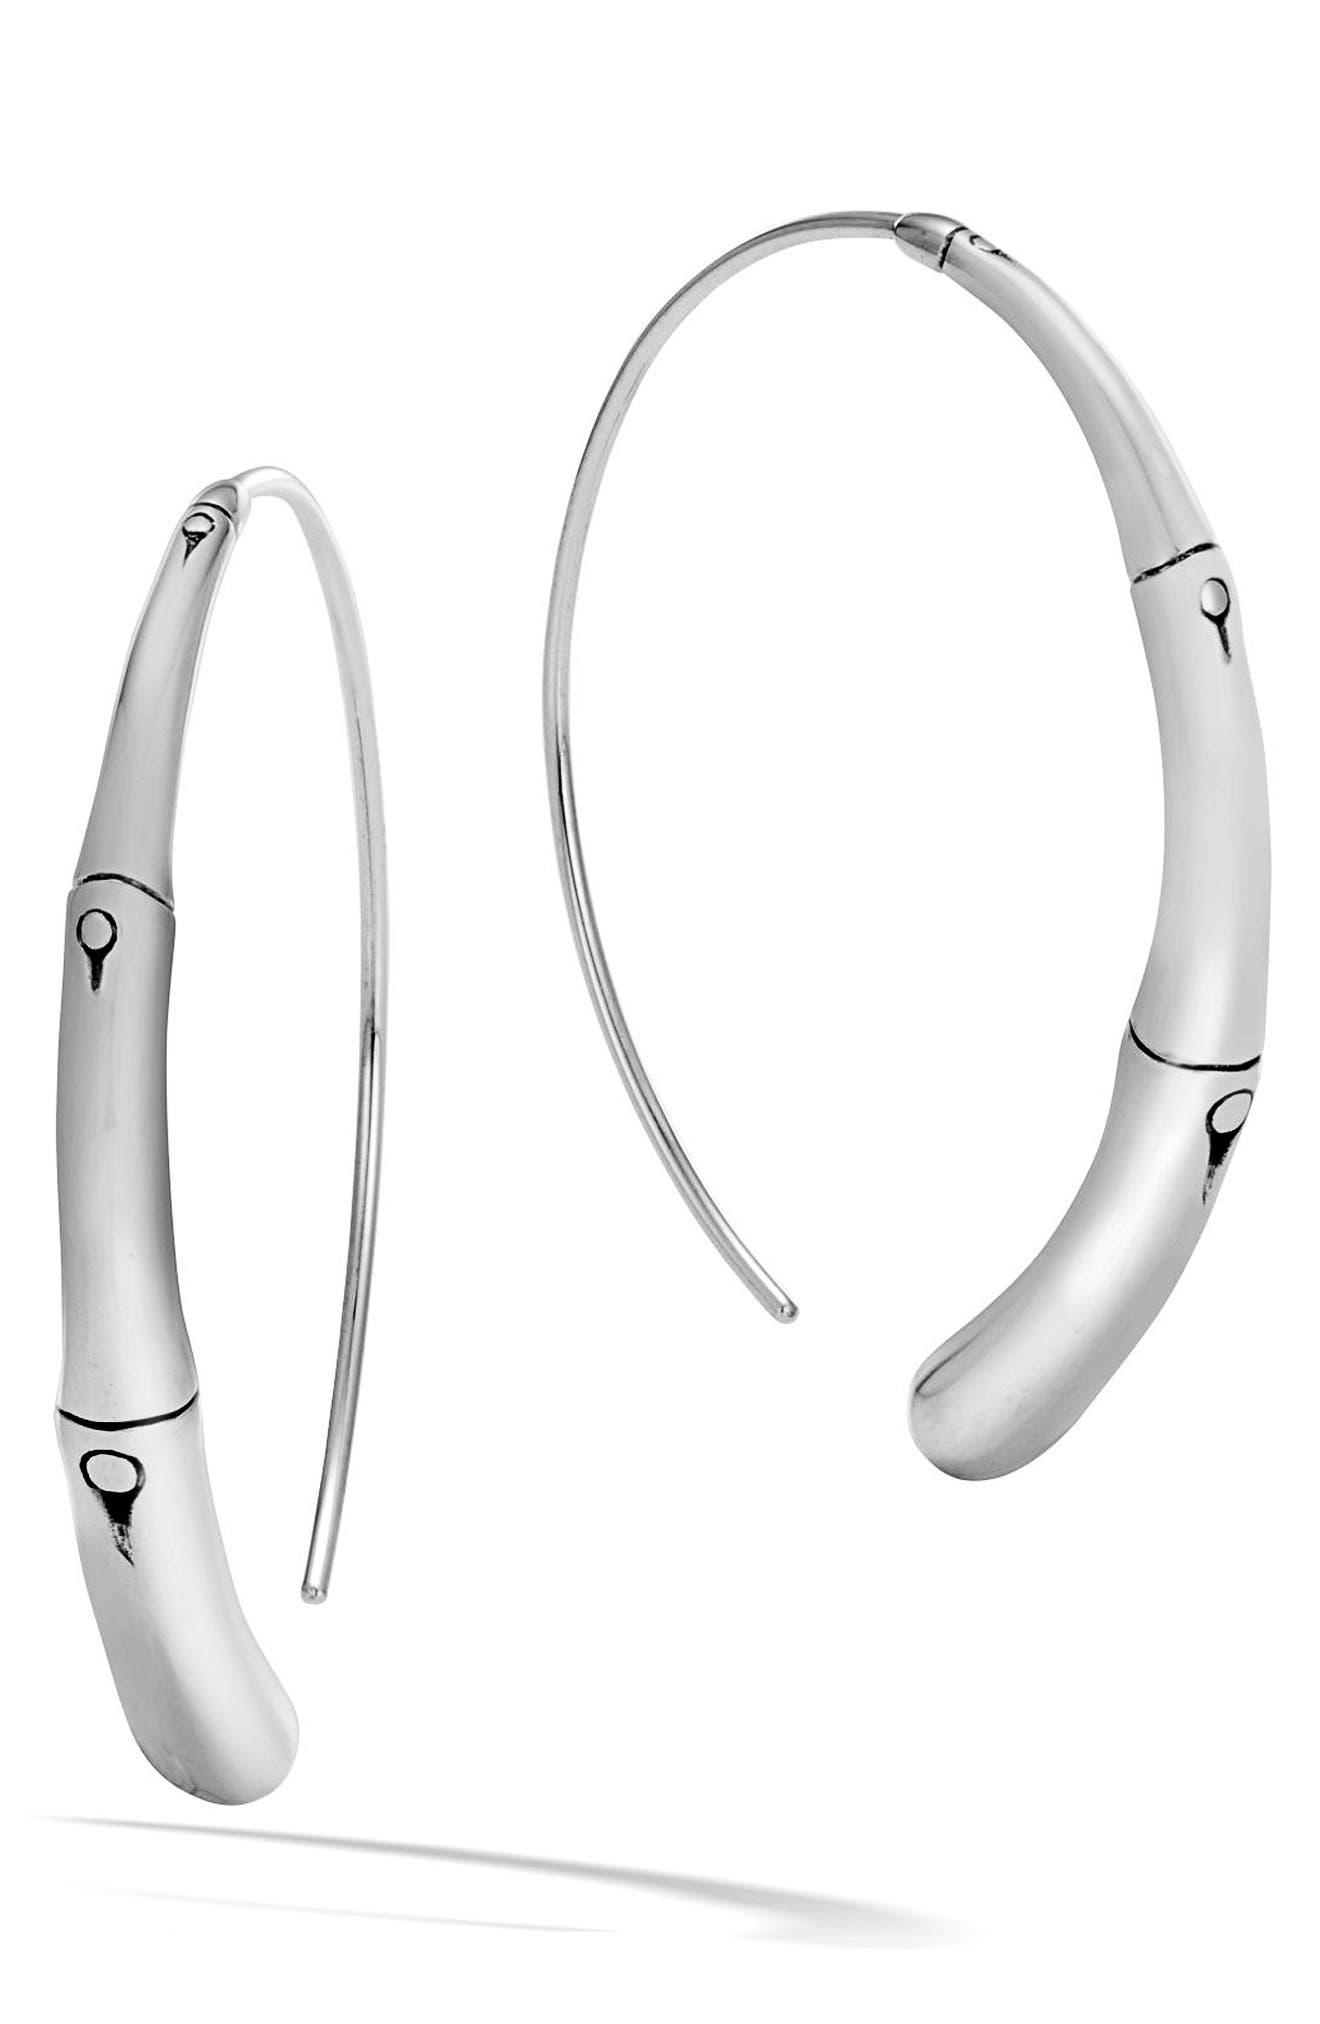 Bamboo Large Hoop Earrings,                         Main,                         color, SILVER